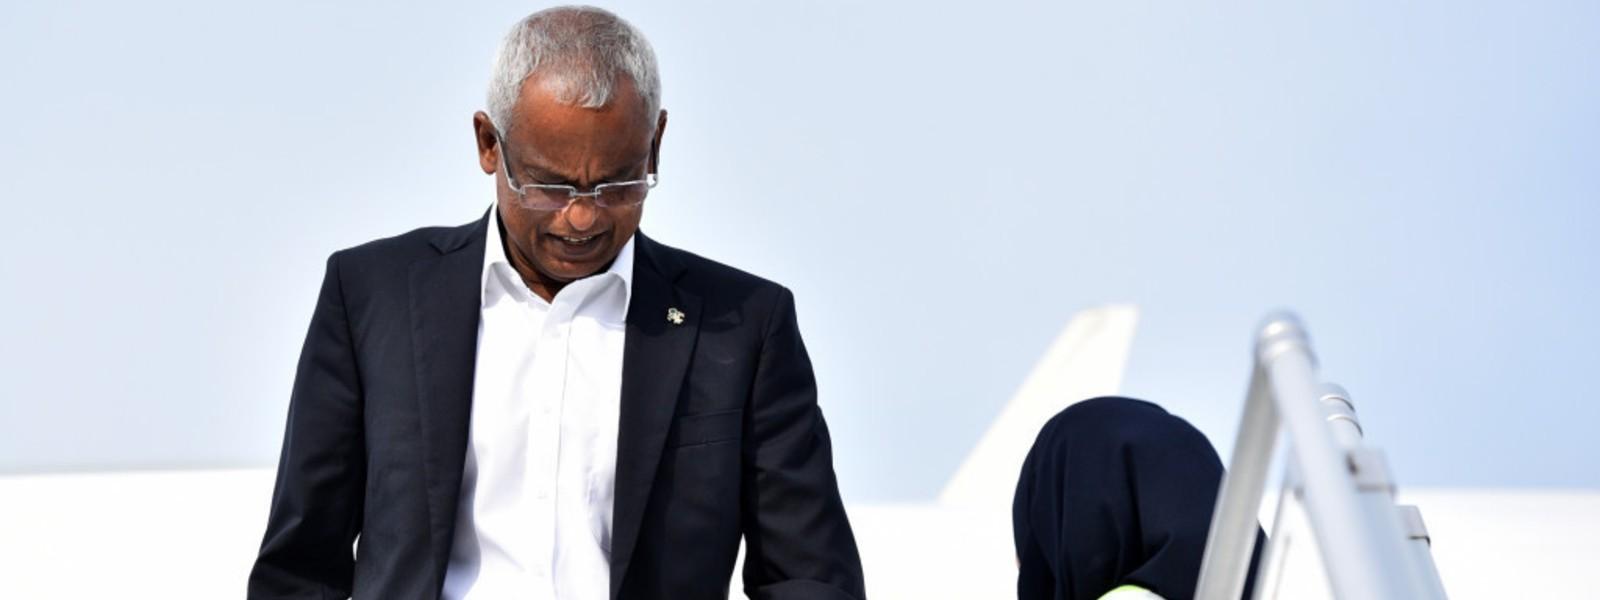 Maldives President in Sri Lanka for official visit